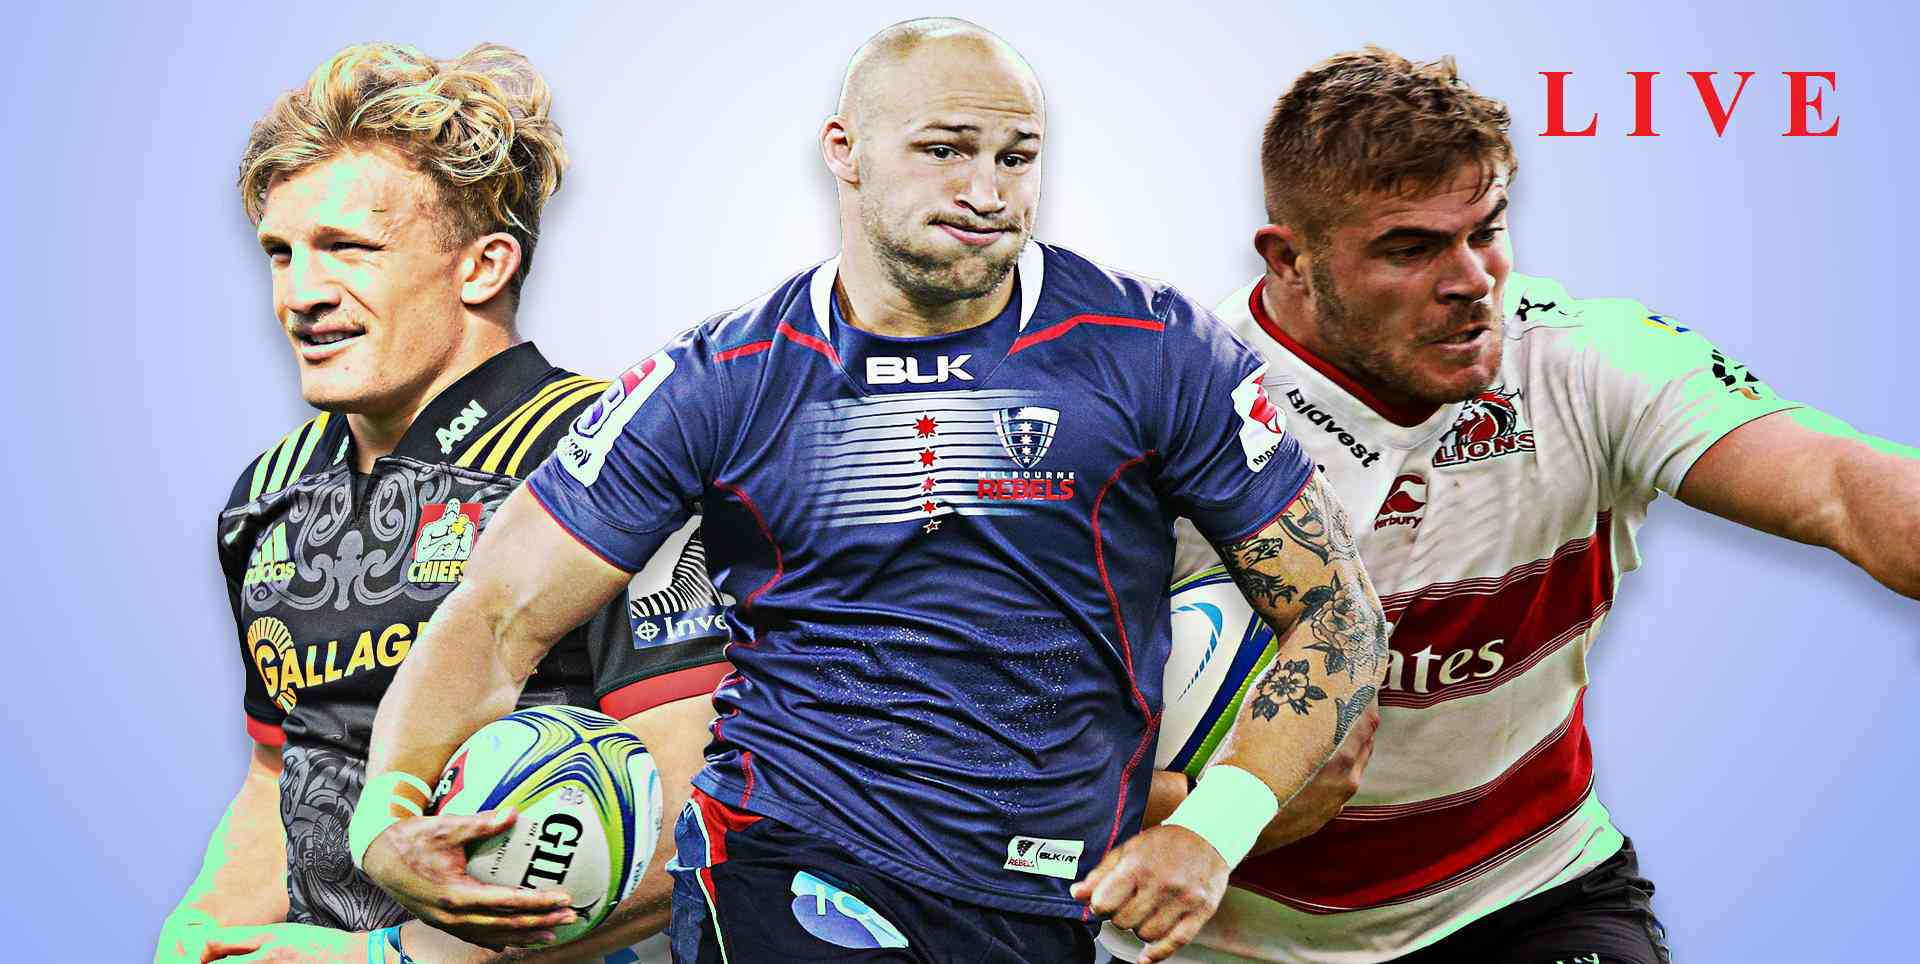 edinburgh-vs-stade-francais-rugby-online